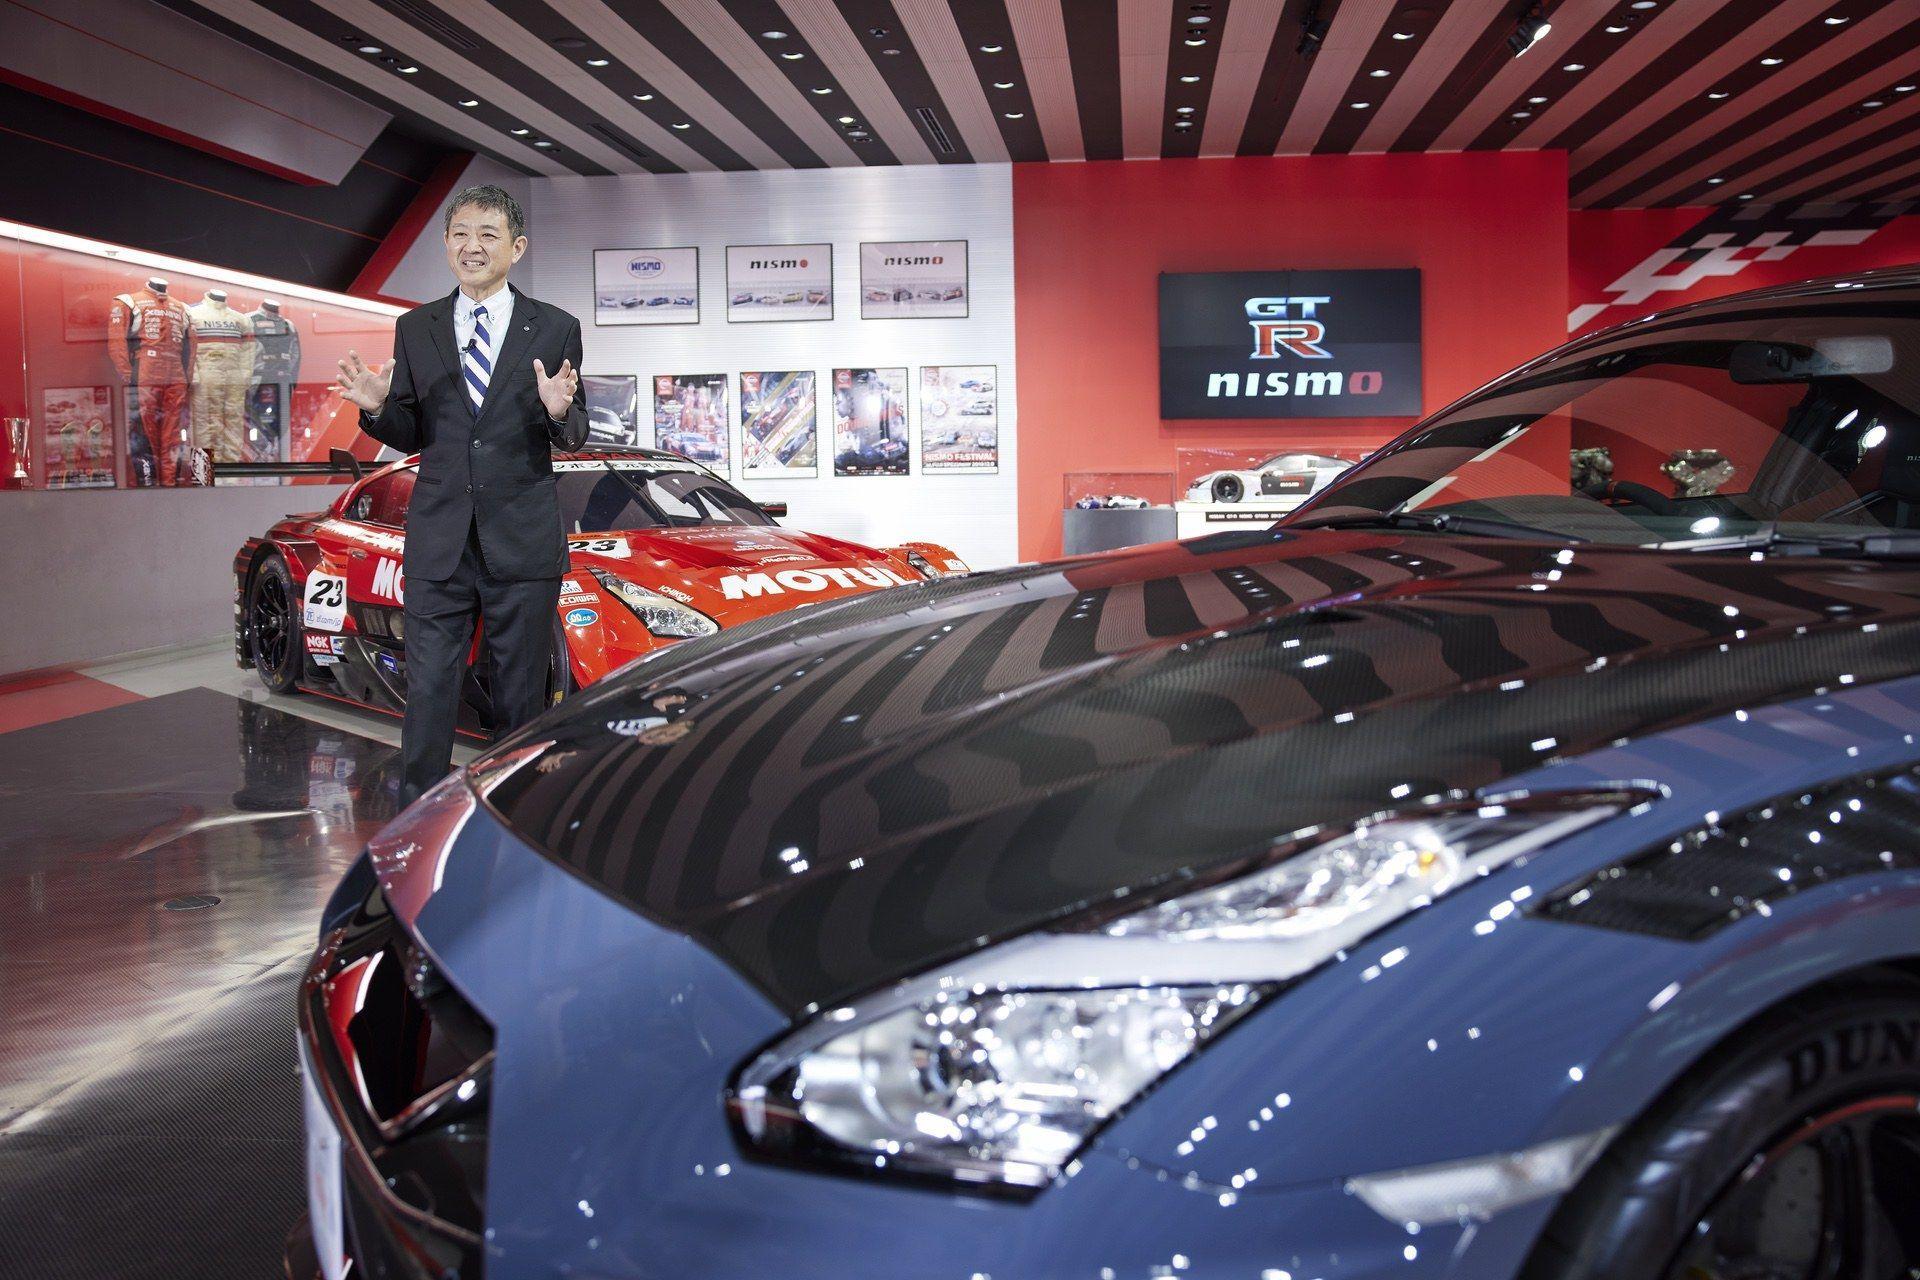 2021_Nissan_GT-R_Nismo-Special_Edition-0008